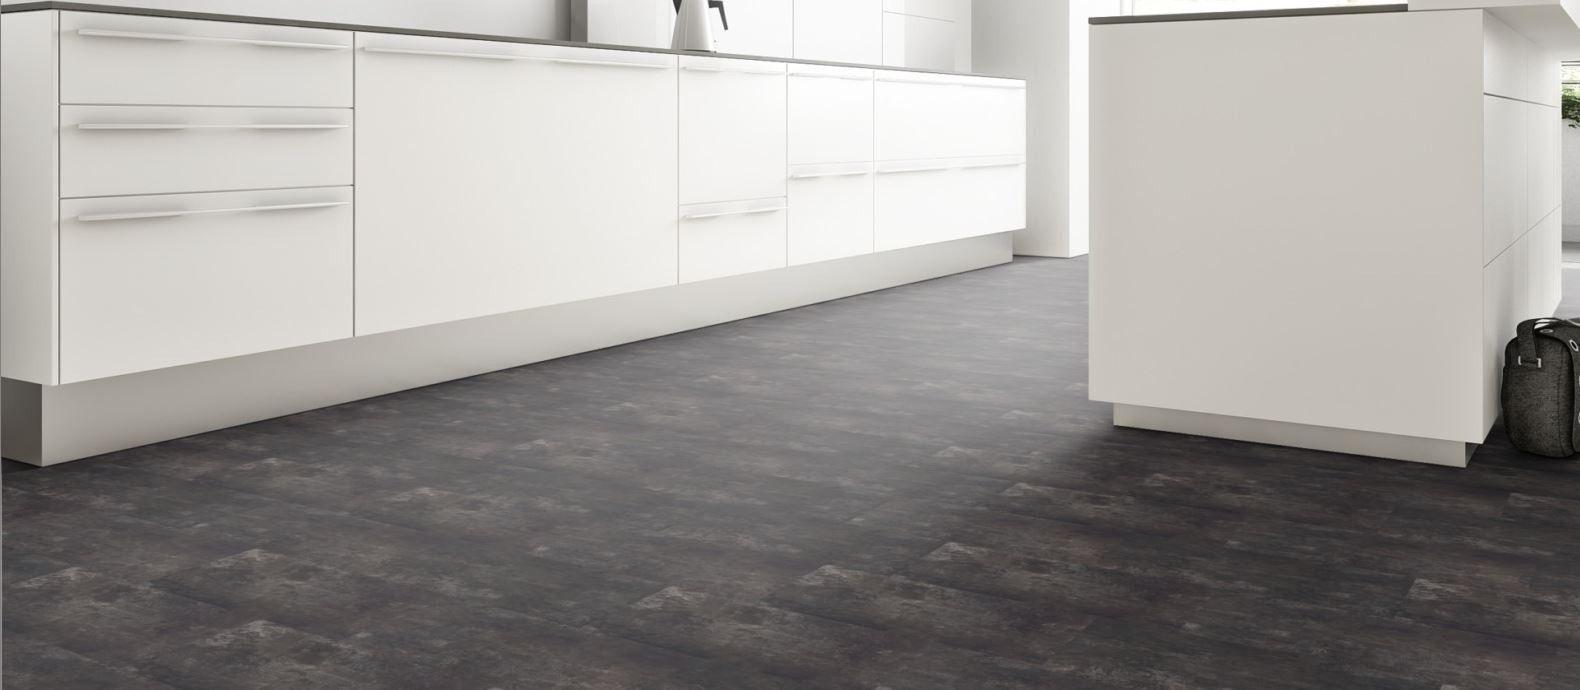 Bodenbelag Küche Vinyl